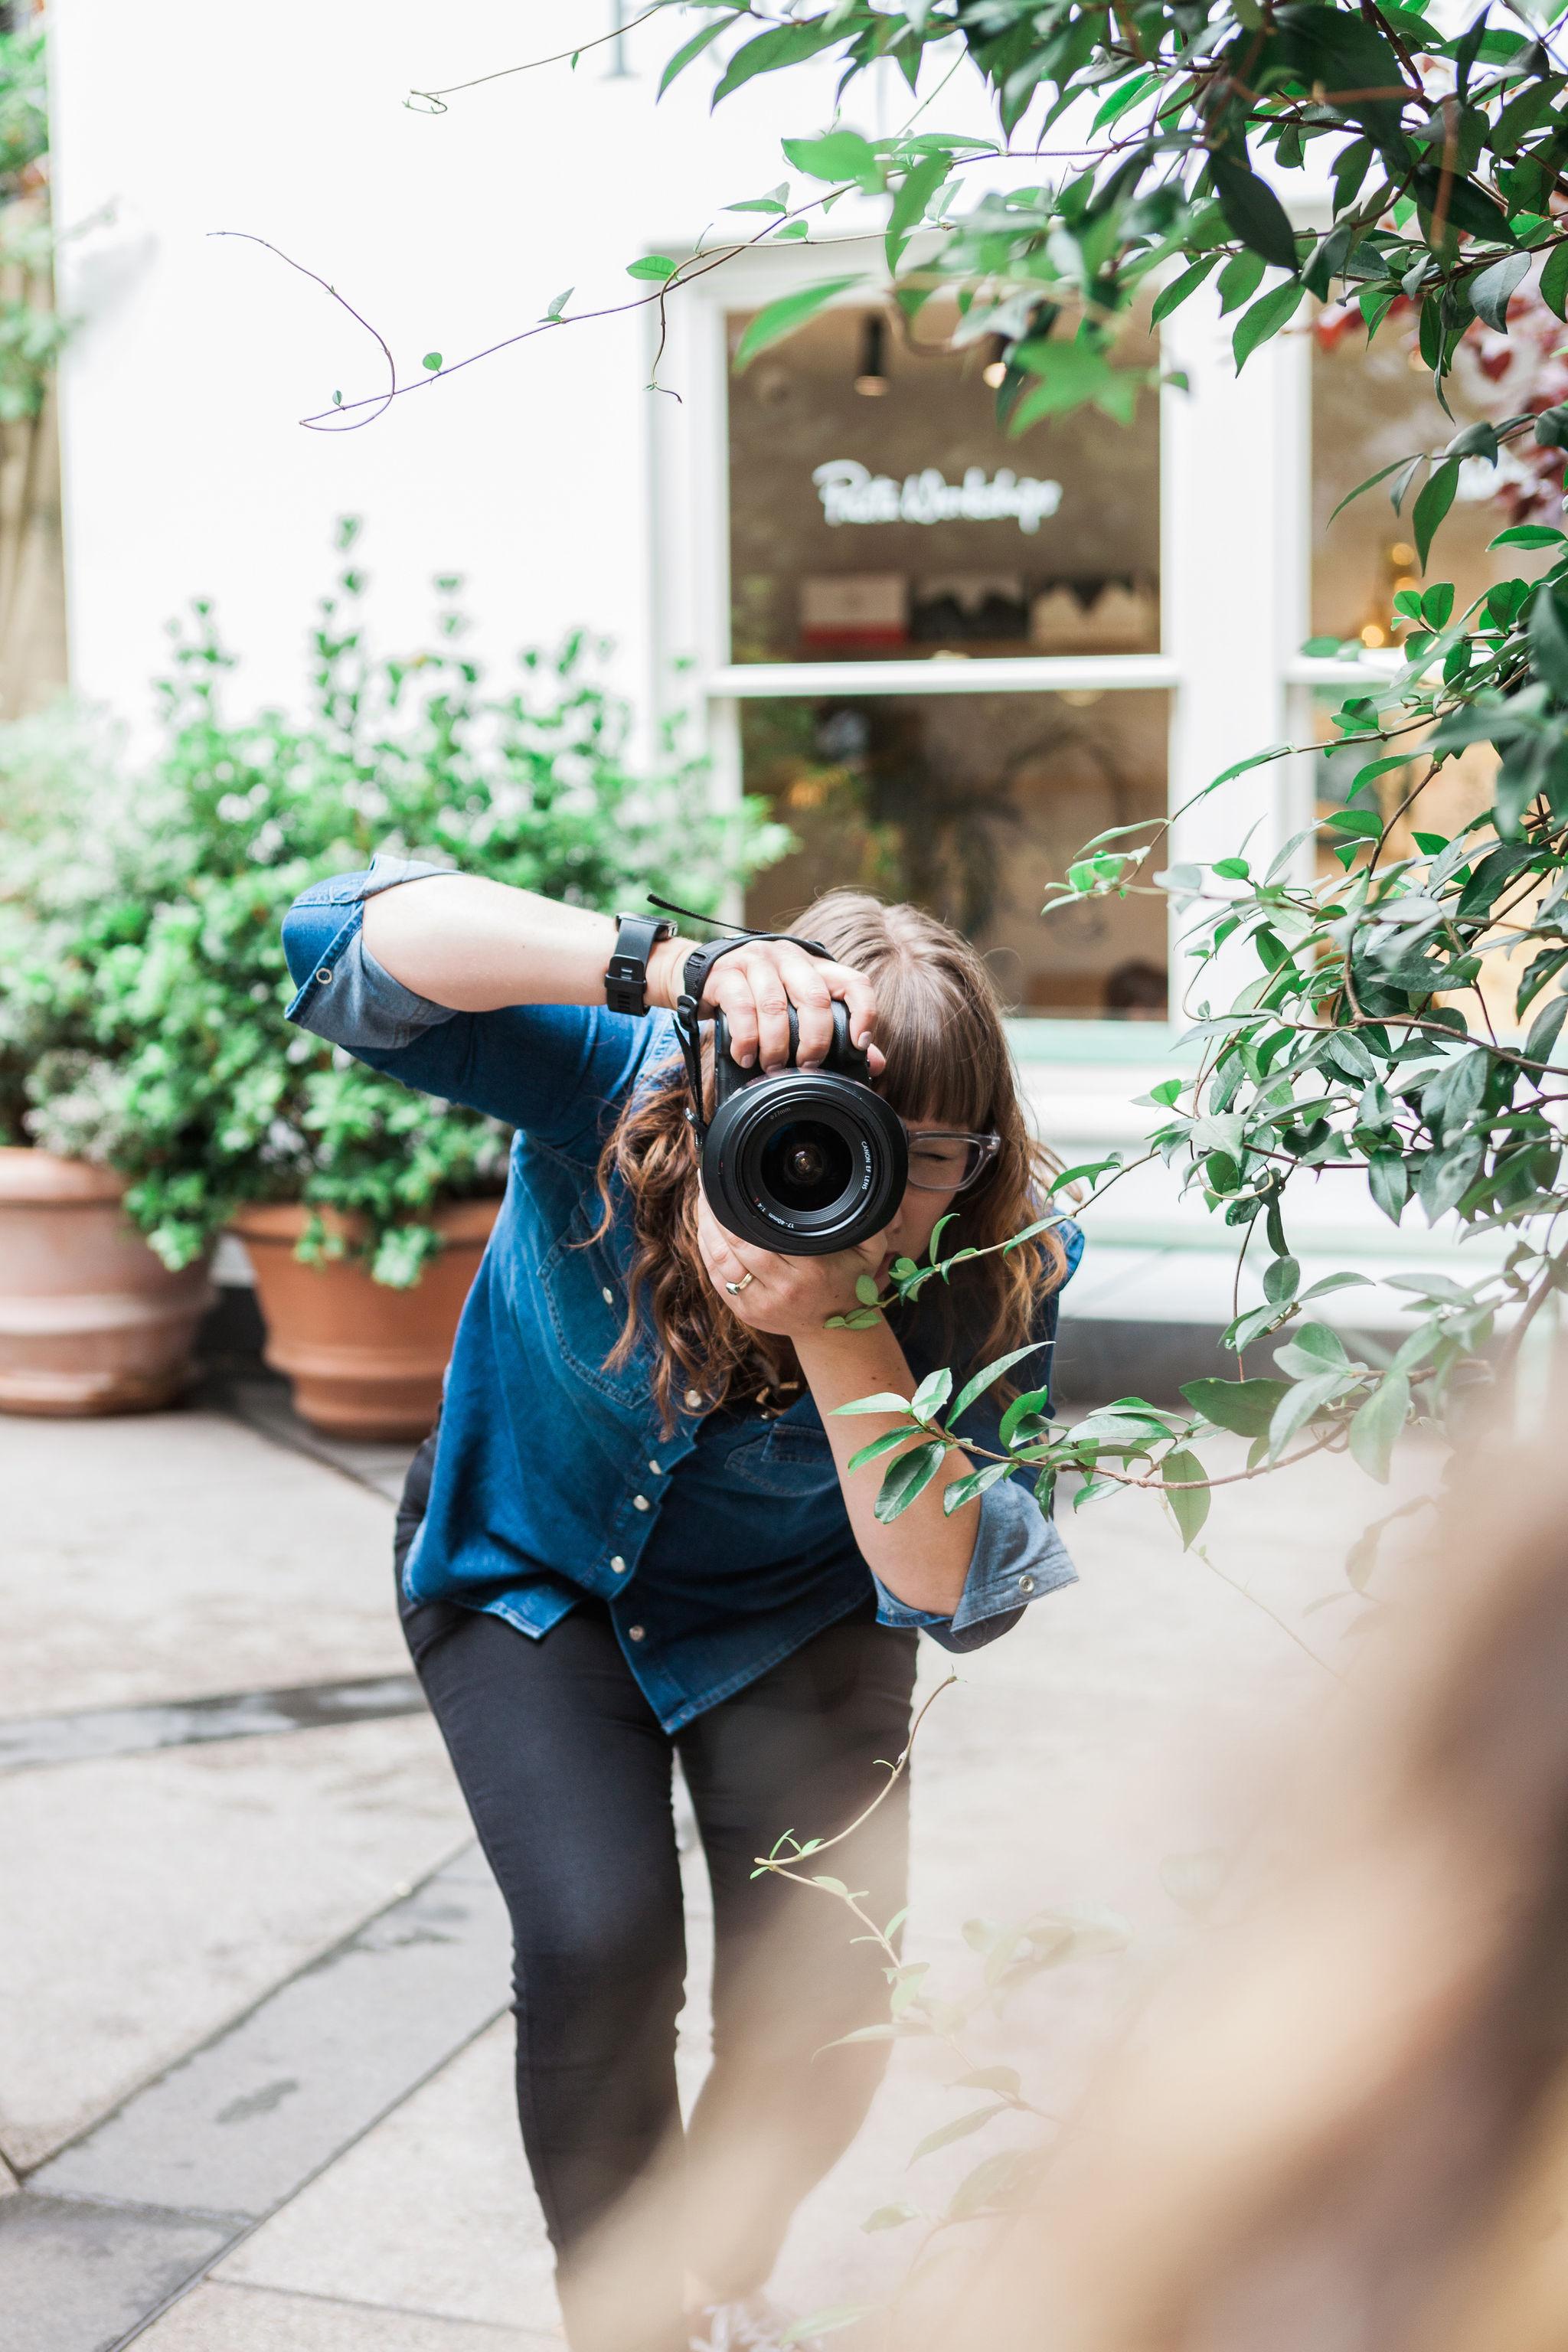 Laura Rose Creative - Anchor & Dash - Creative Brand Photography